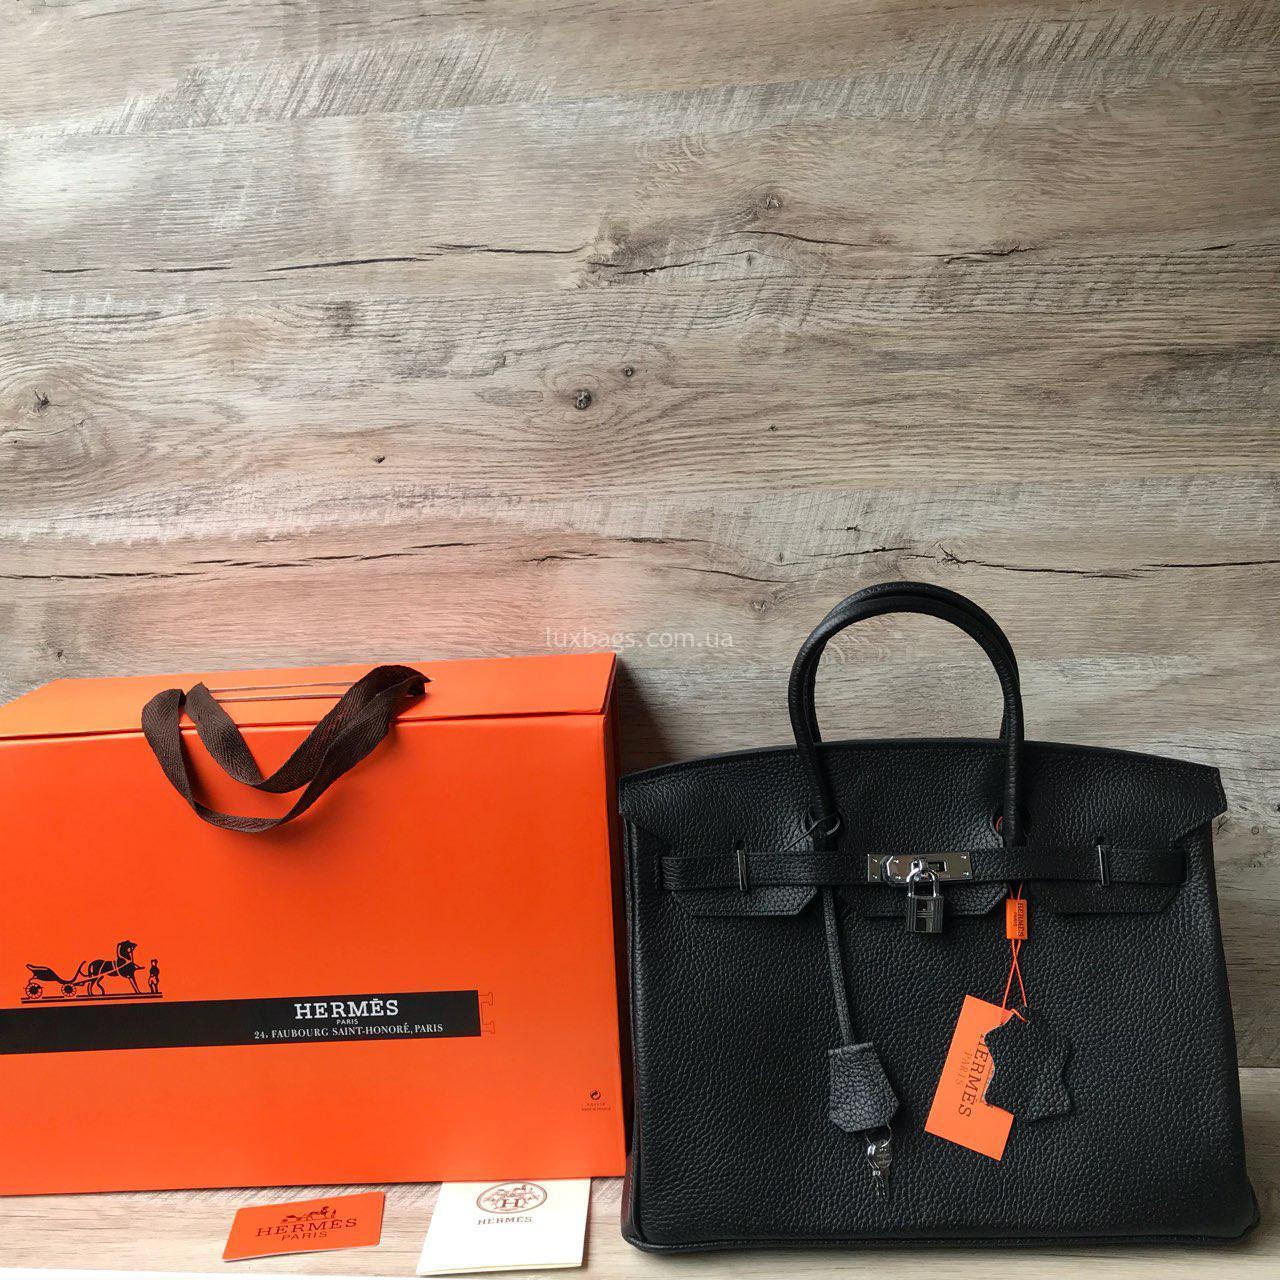 00a944f3187e Женская кожаная сумка Hermes Birkin купить на lux-bags